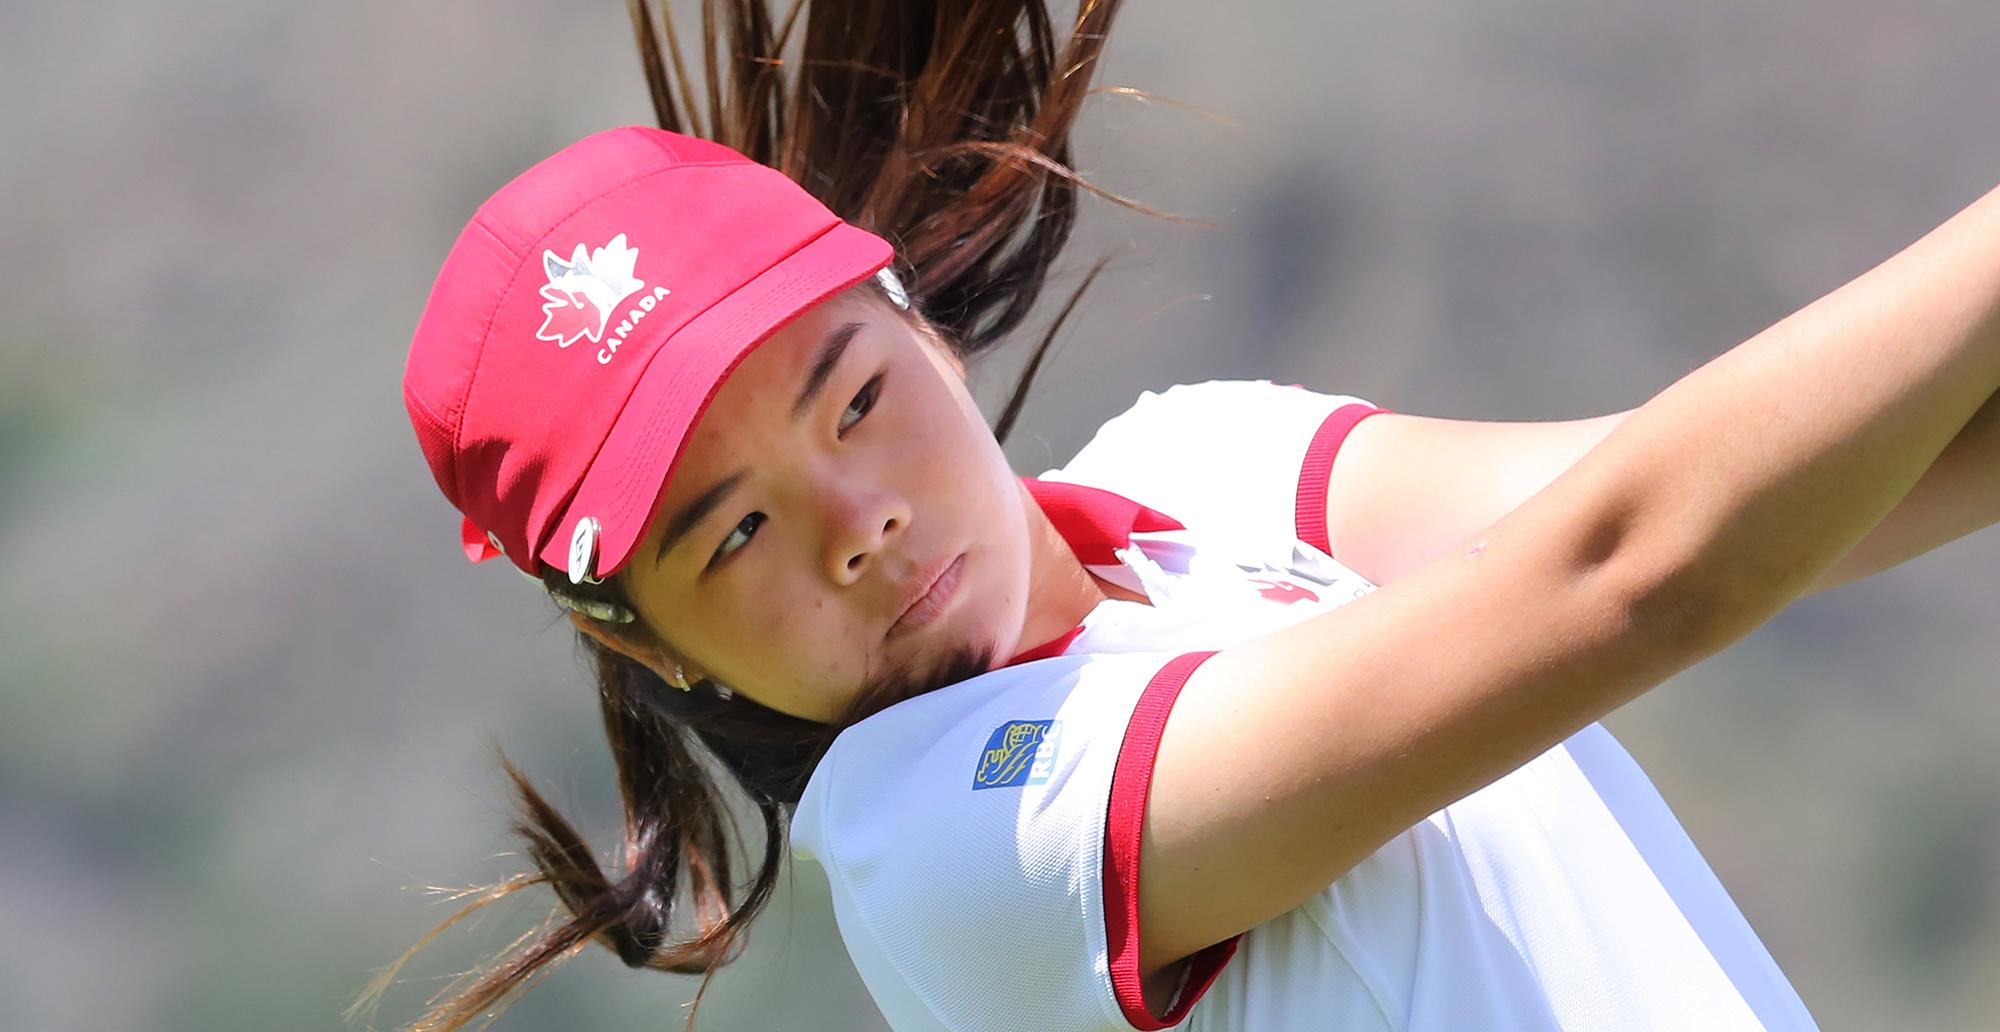 team canada's kathrine chan cruises to nine-stroke victory at bob